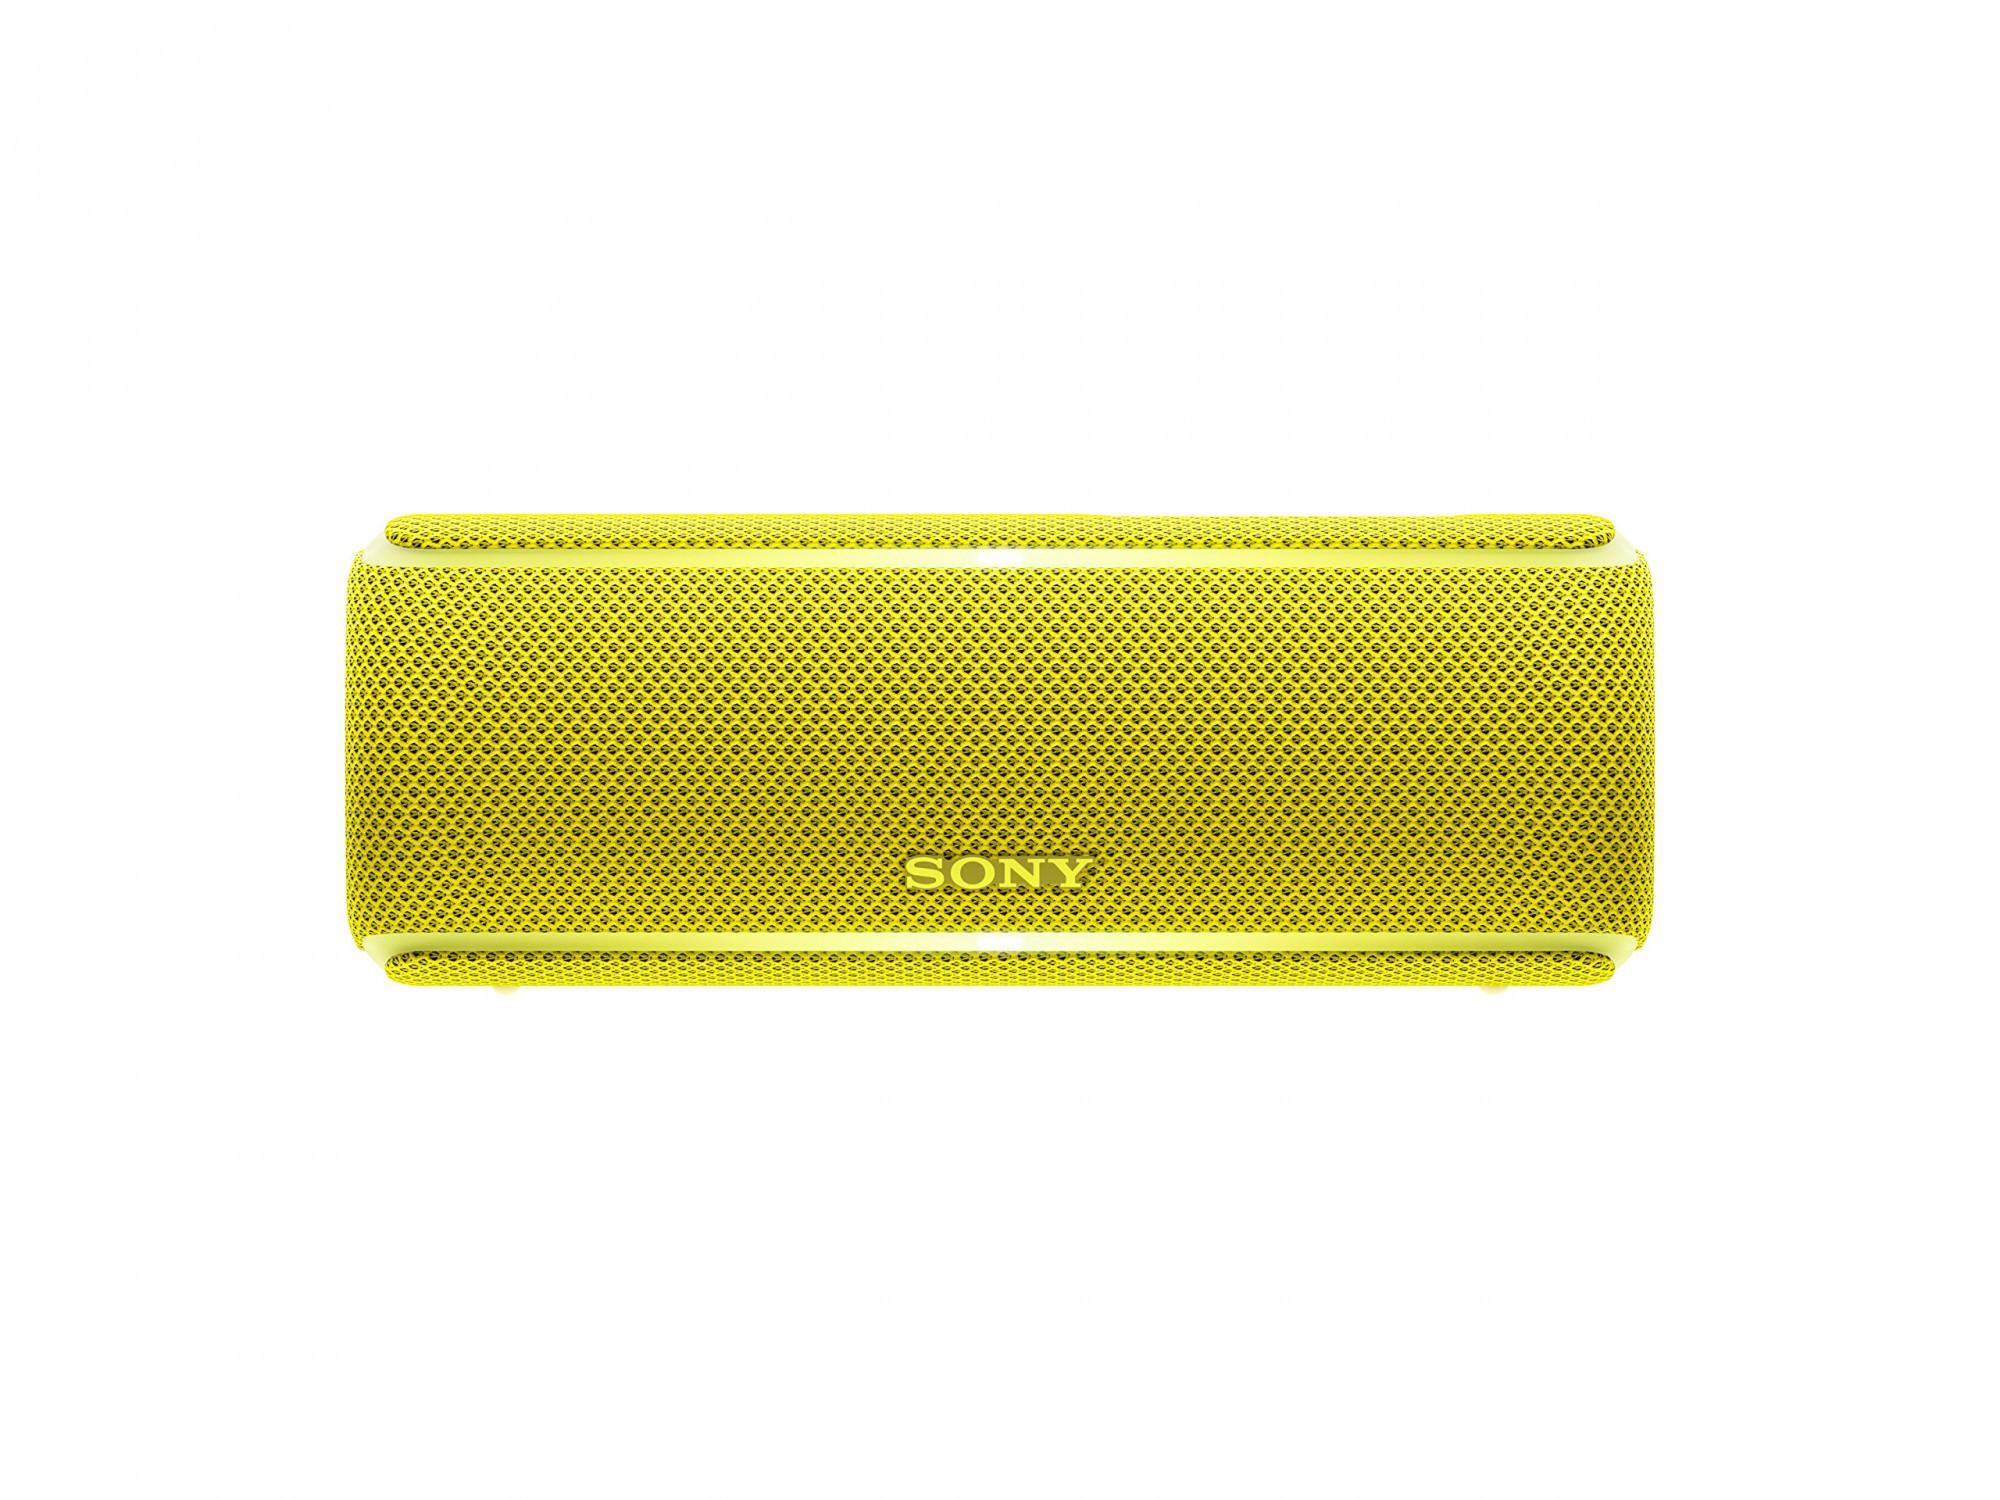 Sony SRS-XB21 kabelloser Bluetooth Lautsprecher #gelb